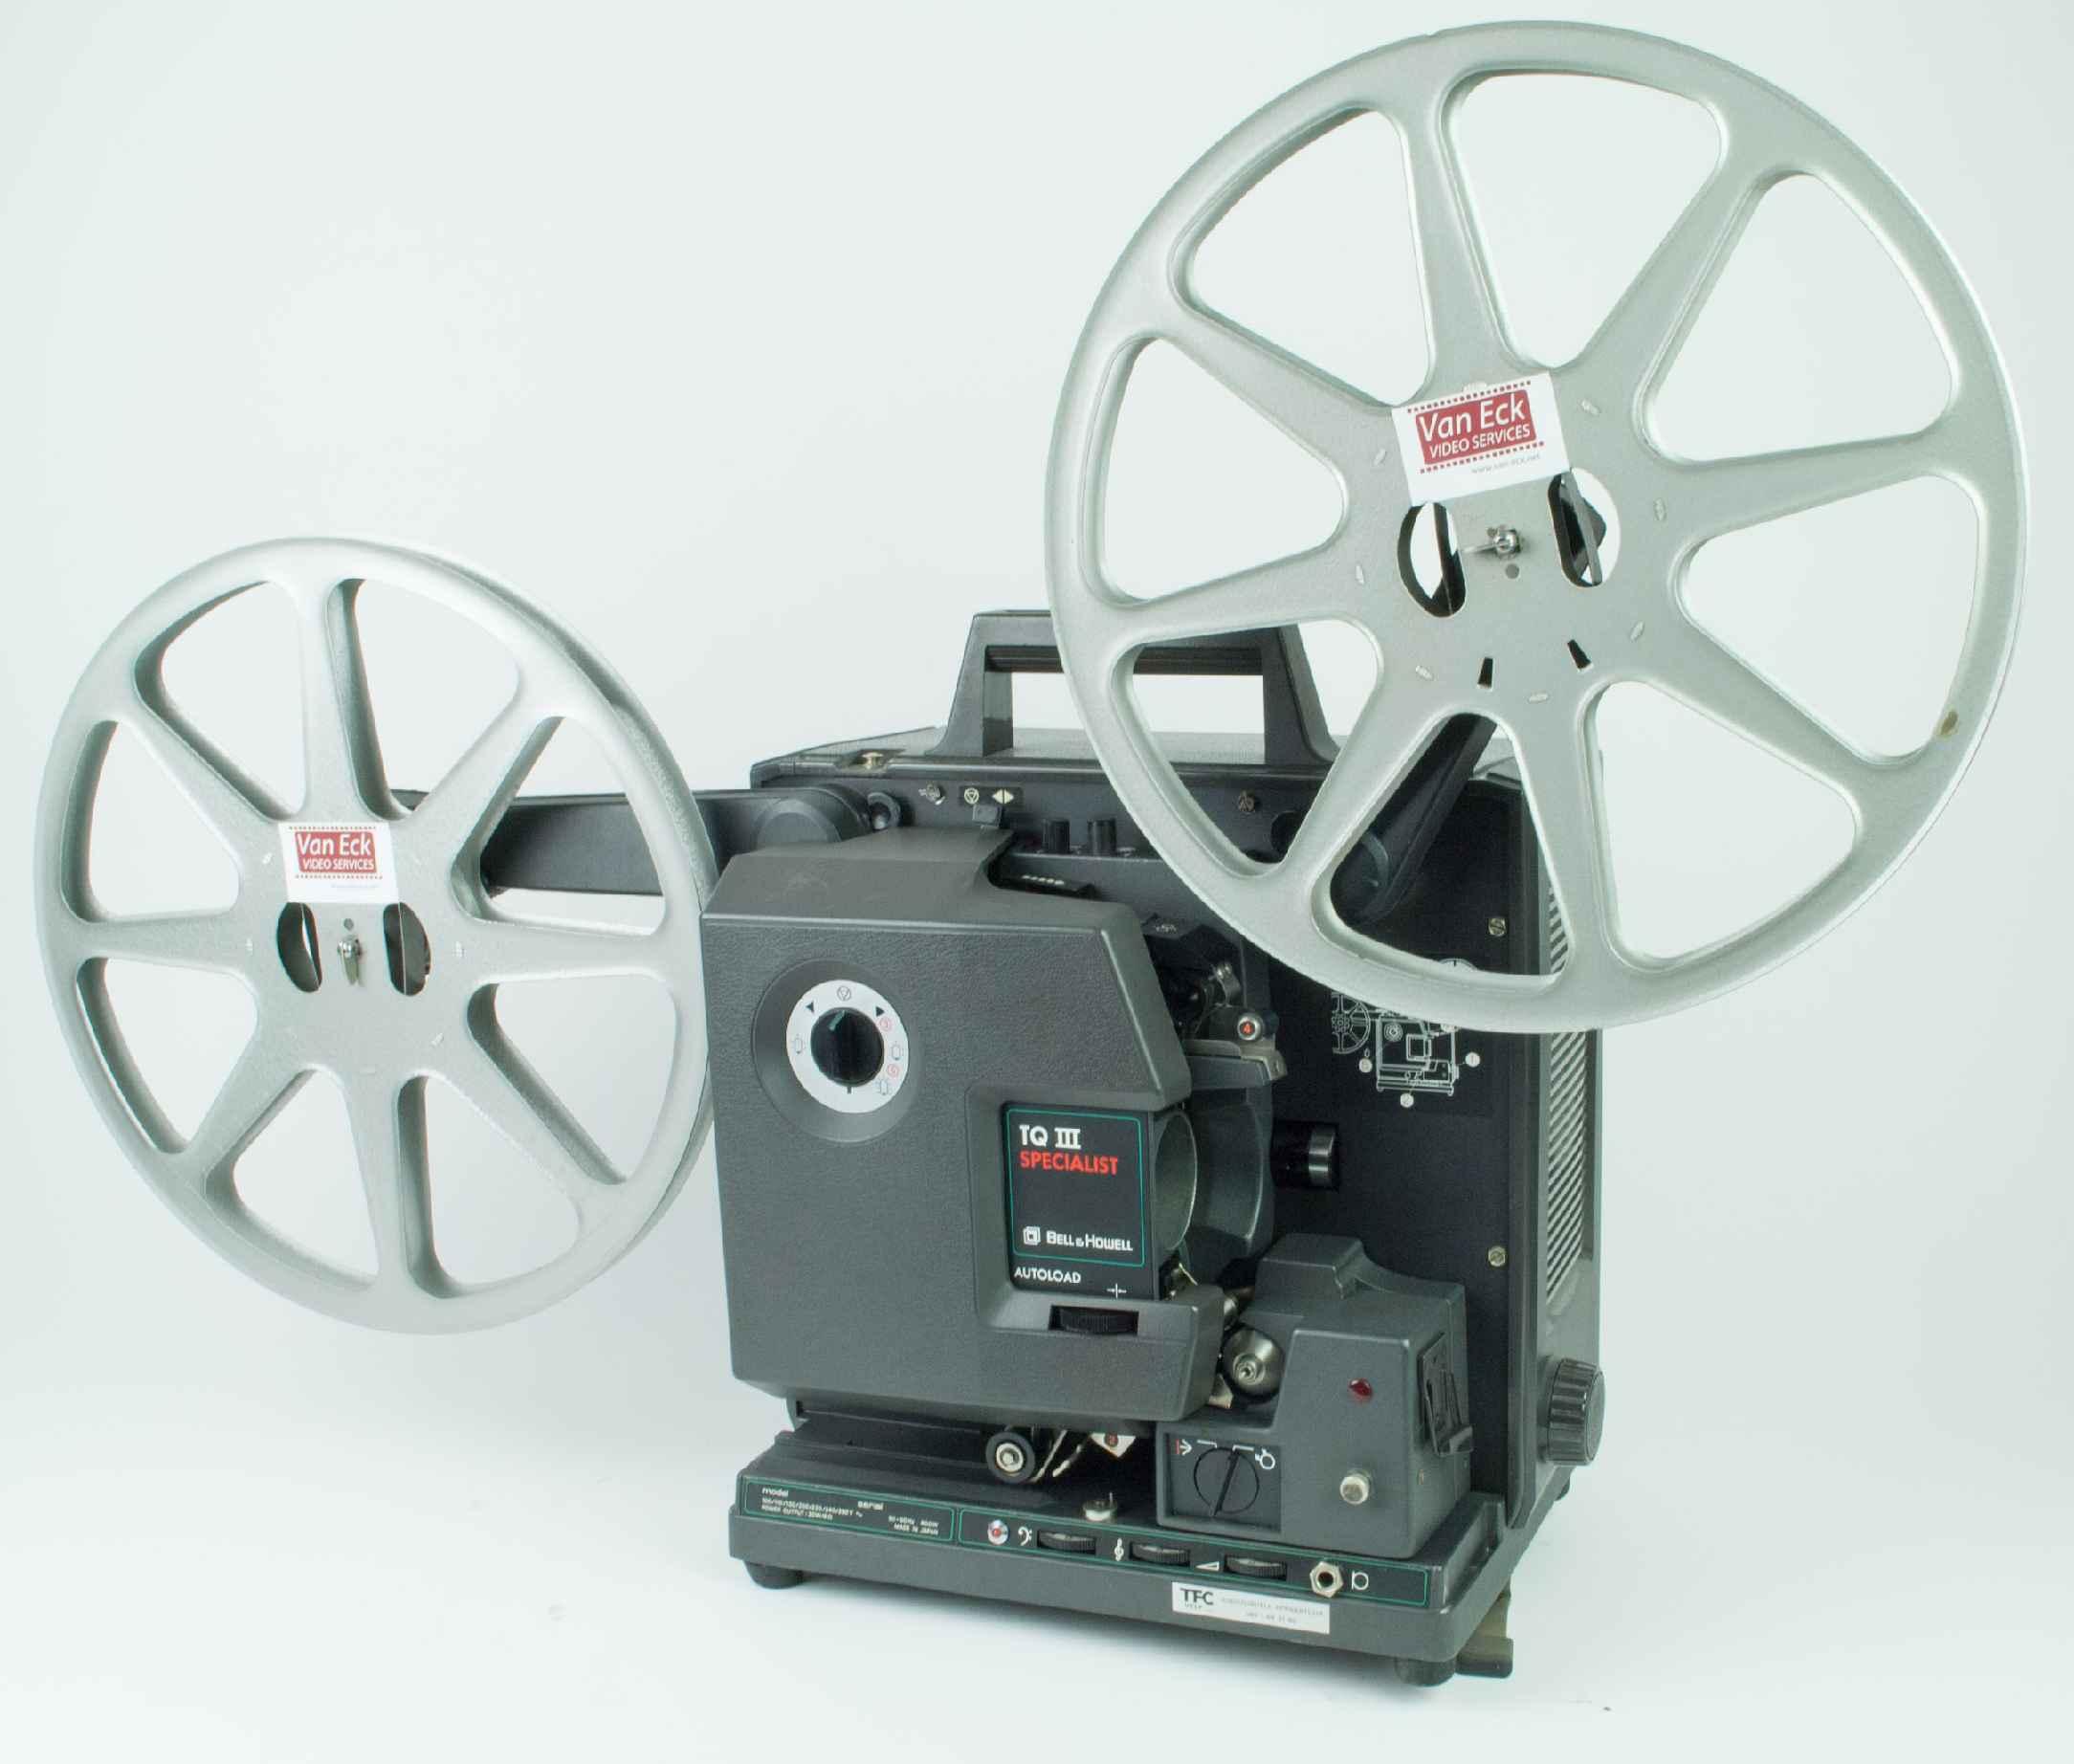 Bell & Howell 1698 (TQ3 specialist) (16mm filmosound), Film